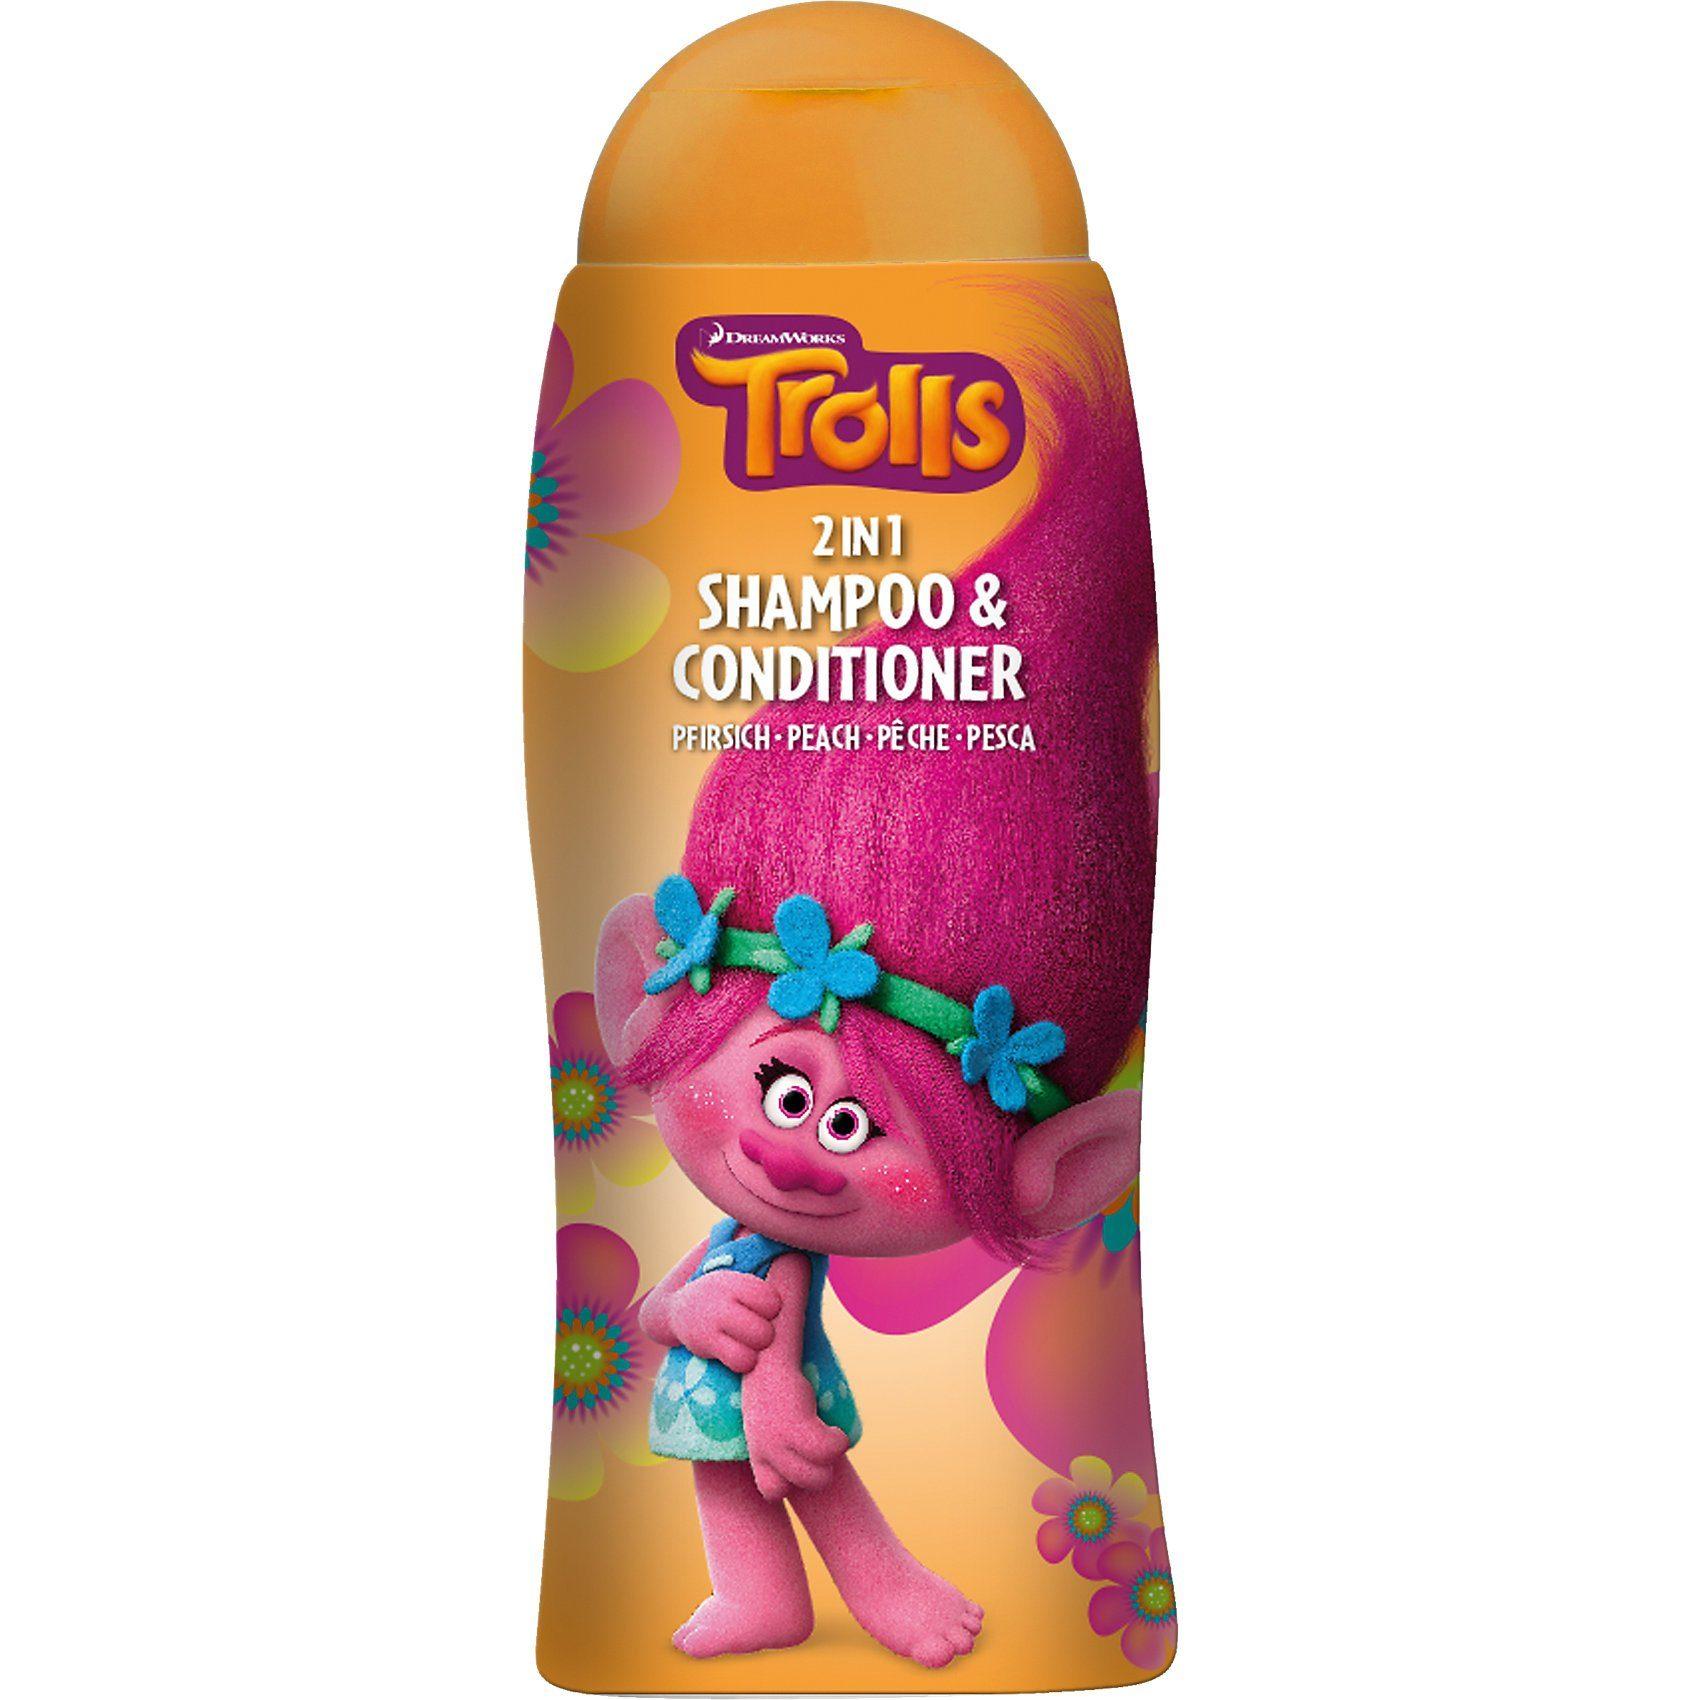 Shampoo & Conditioner 2 in 1, Trolls, 250 ml